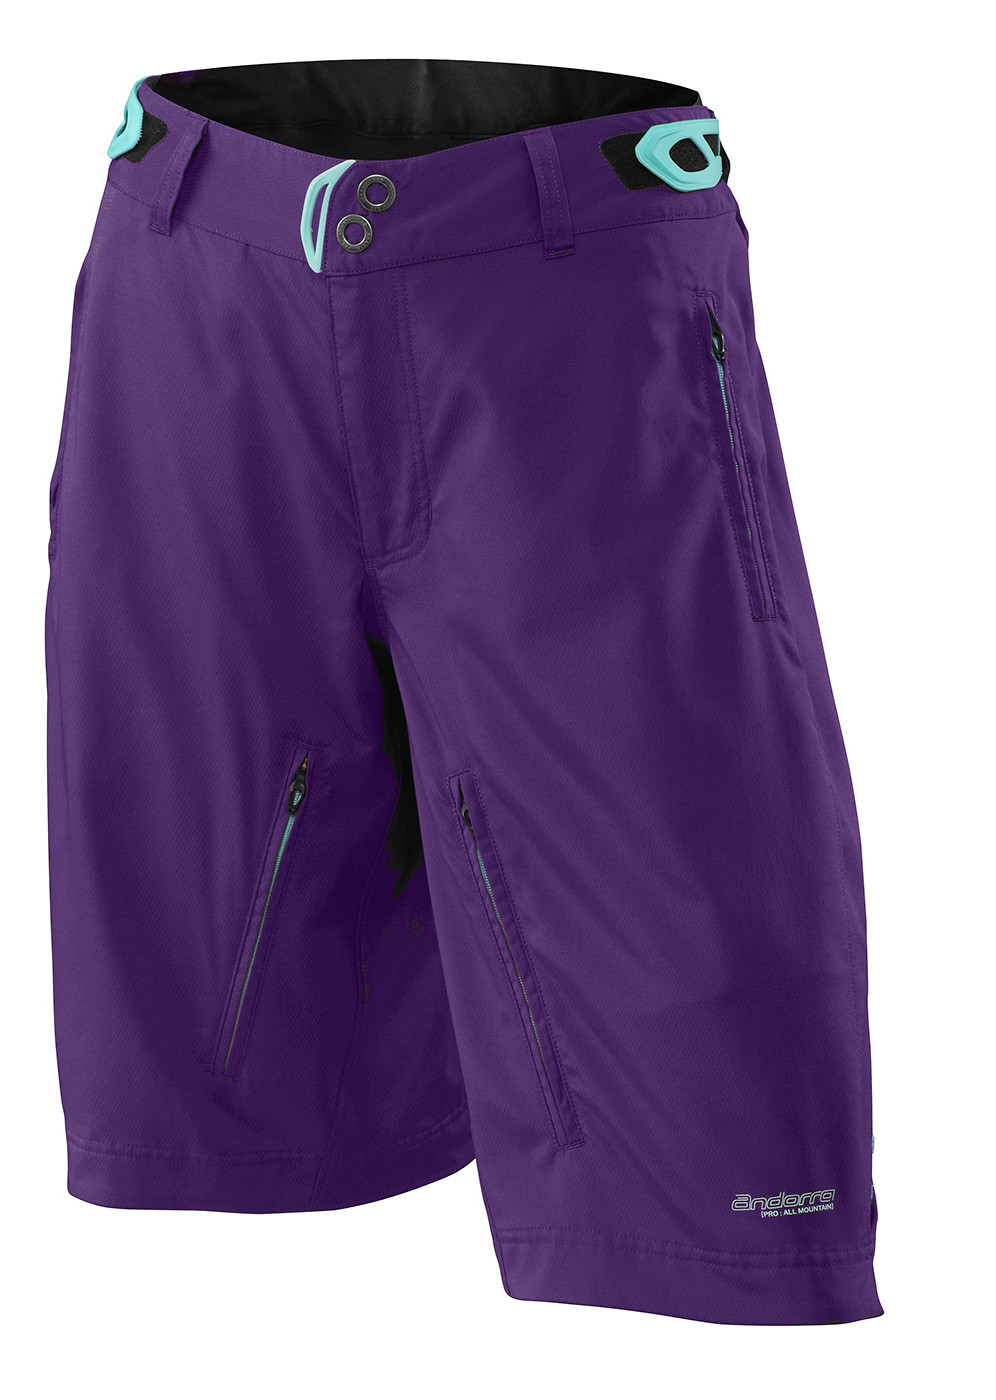 Specialized Women's Andorra Pro Short - purple:light teal